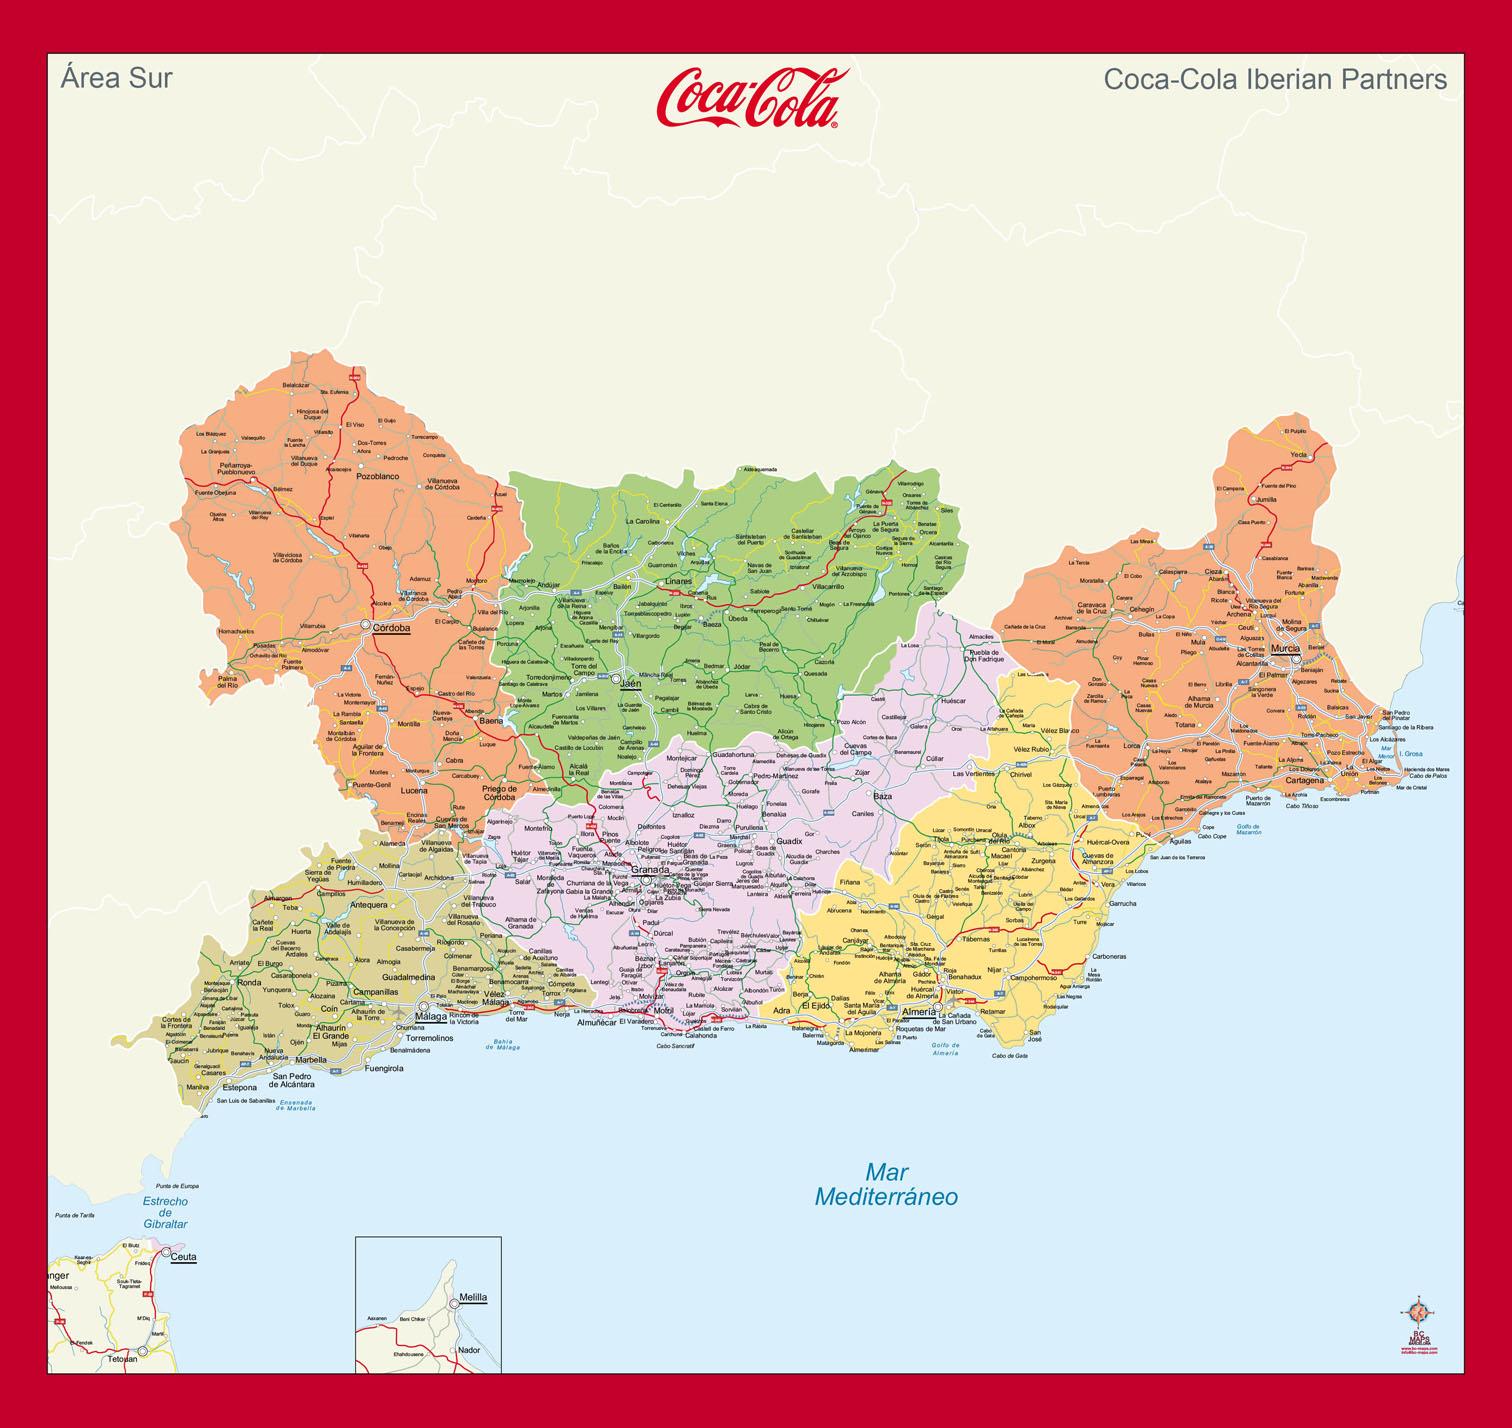 Mapa mural Este Andalucia Coca Cola